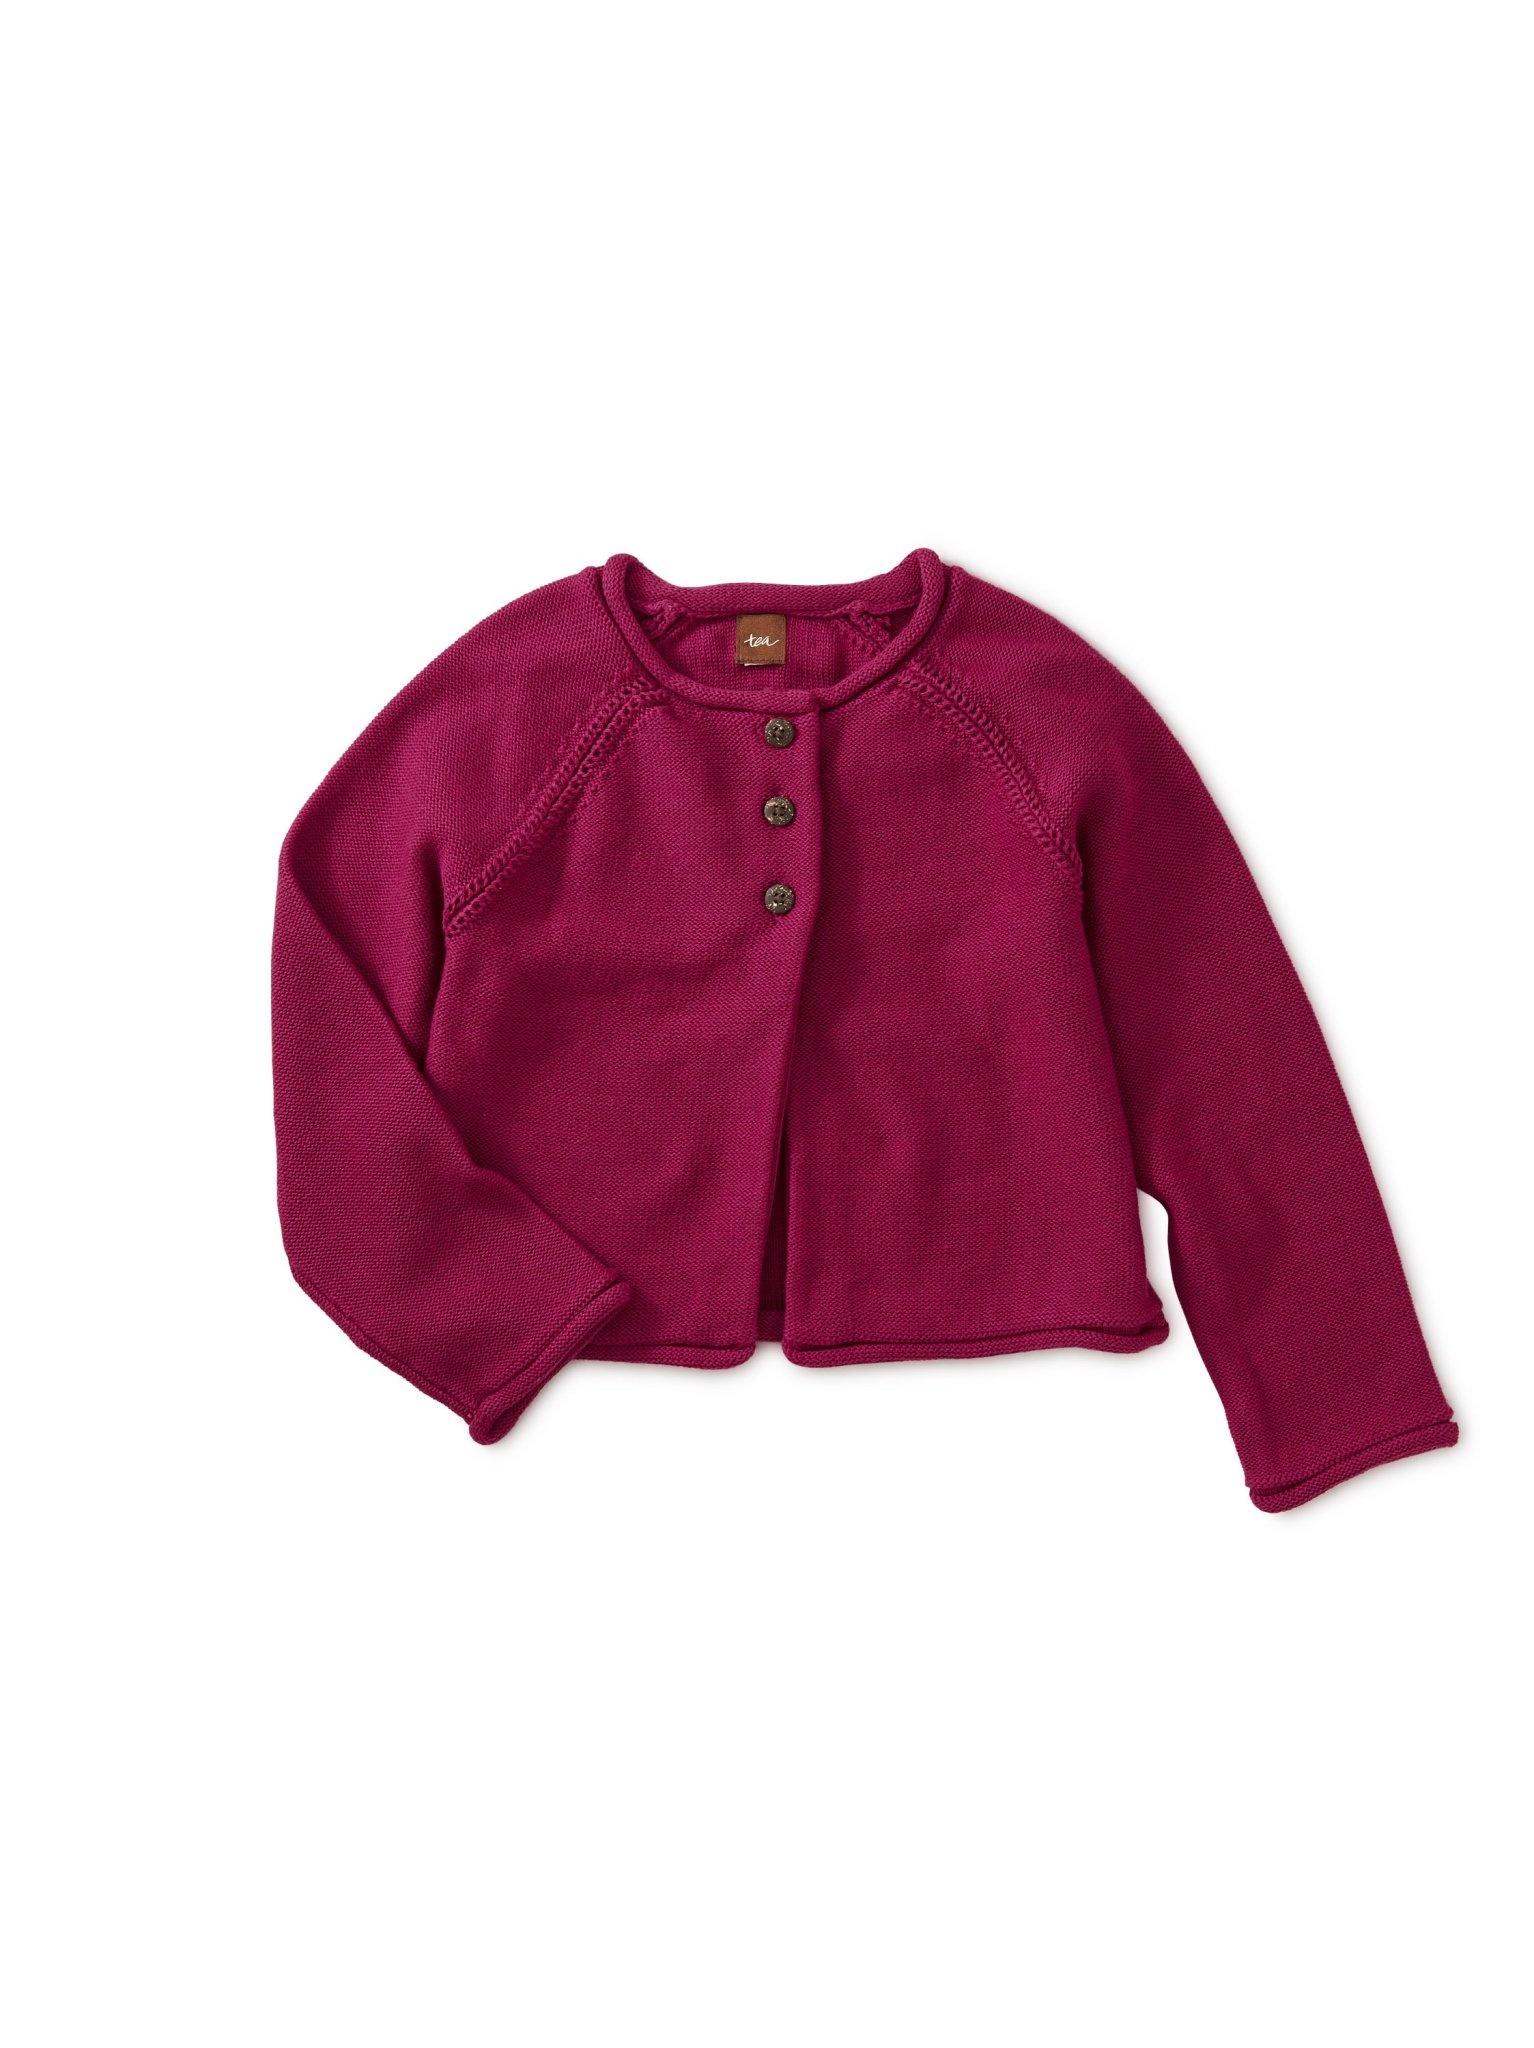 Tea Collection Solid Raglan Sweater Cardigan - Bouquet